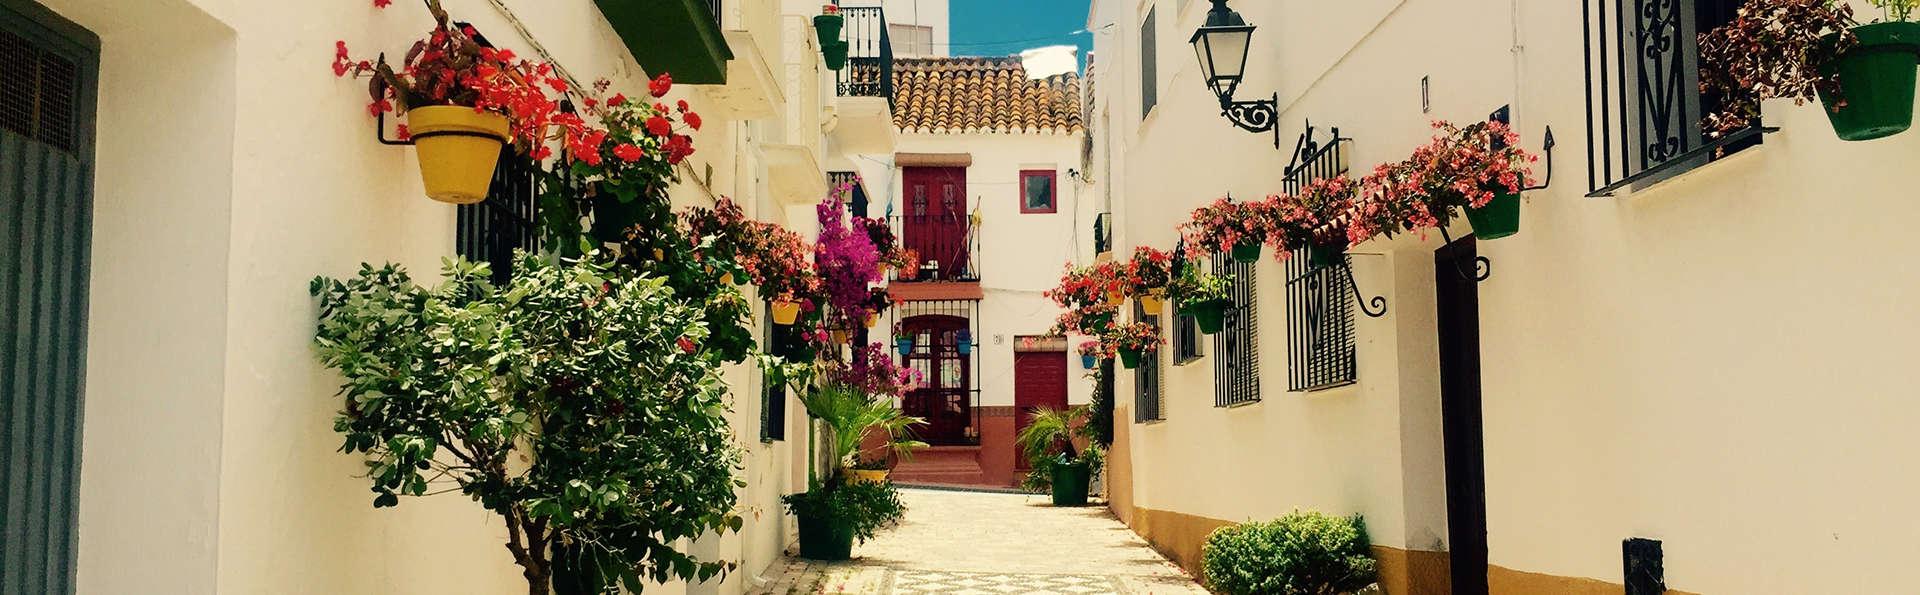 Cortijo del Mar Resort - Edit_Estepona.jpg